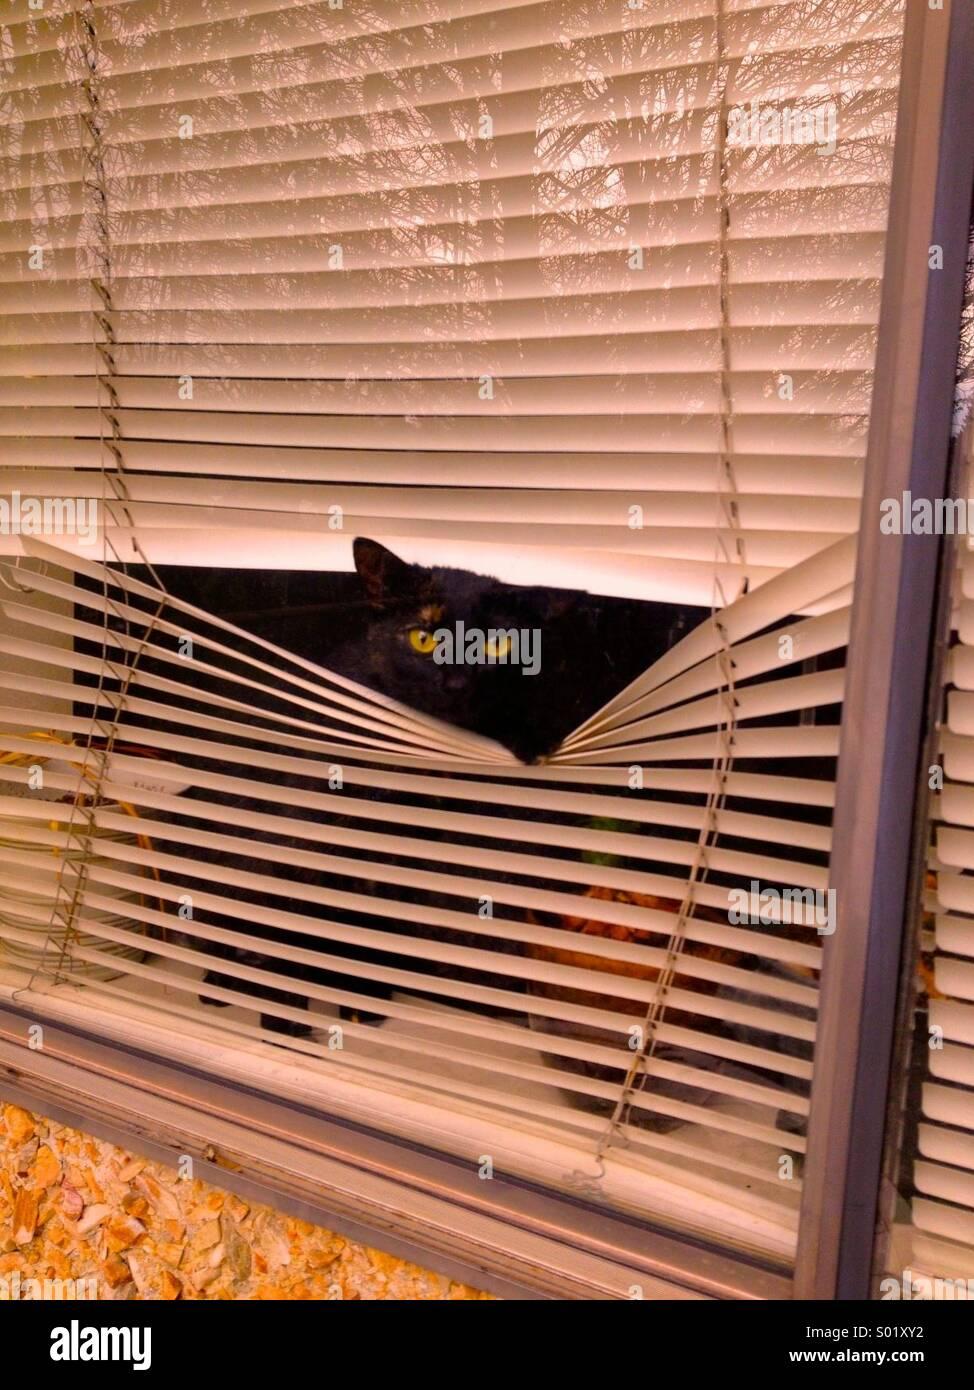 Security cat - Stock Image